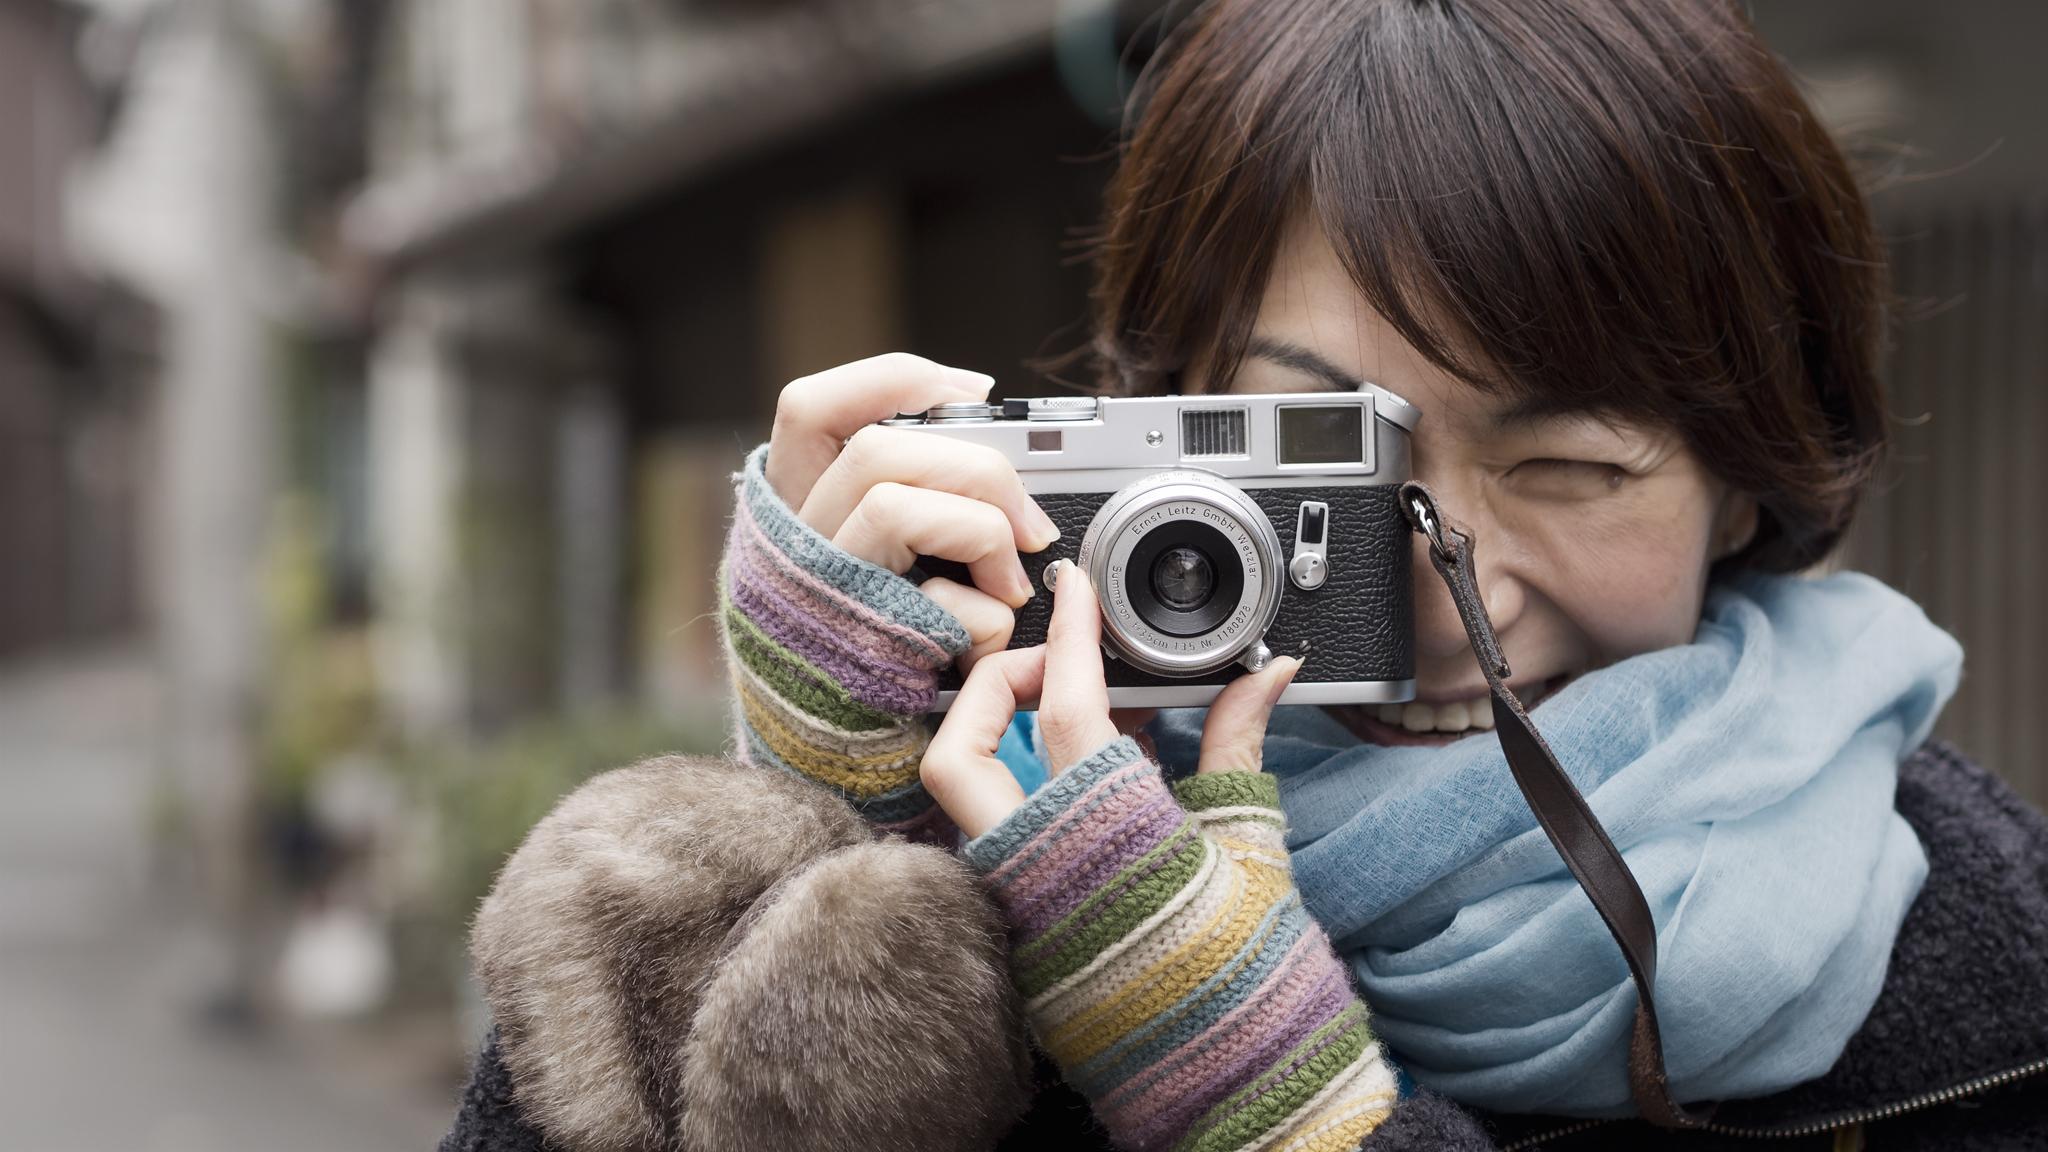 Hintergrundbilder kamera leica frau klassisch mädchen japan